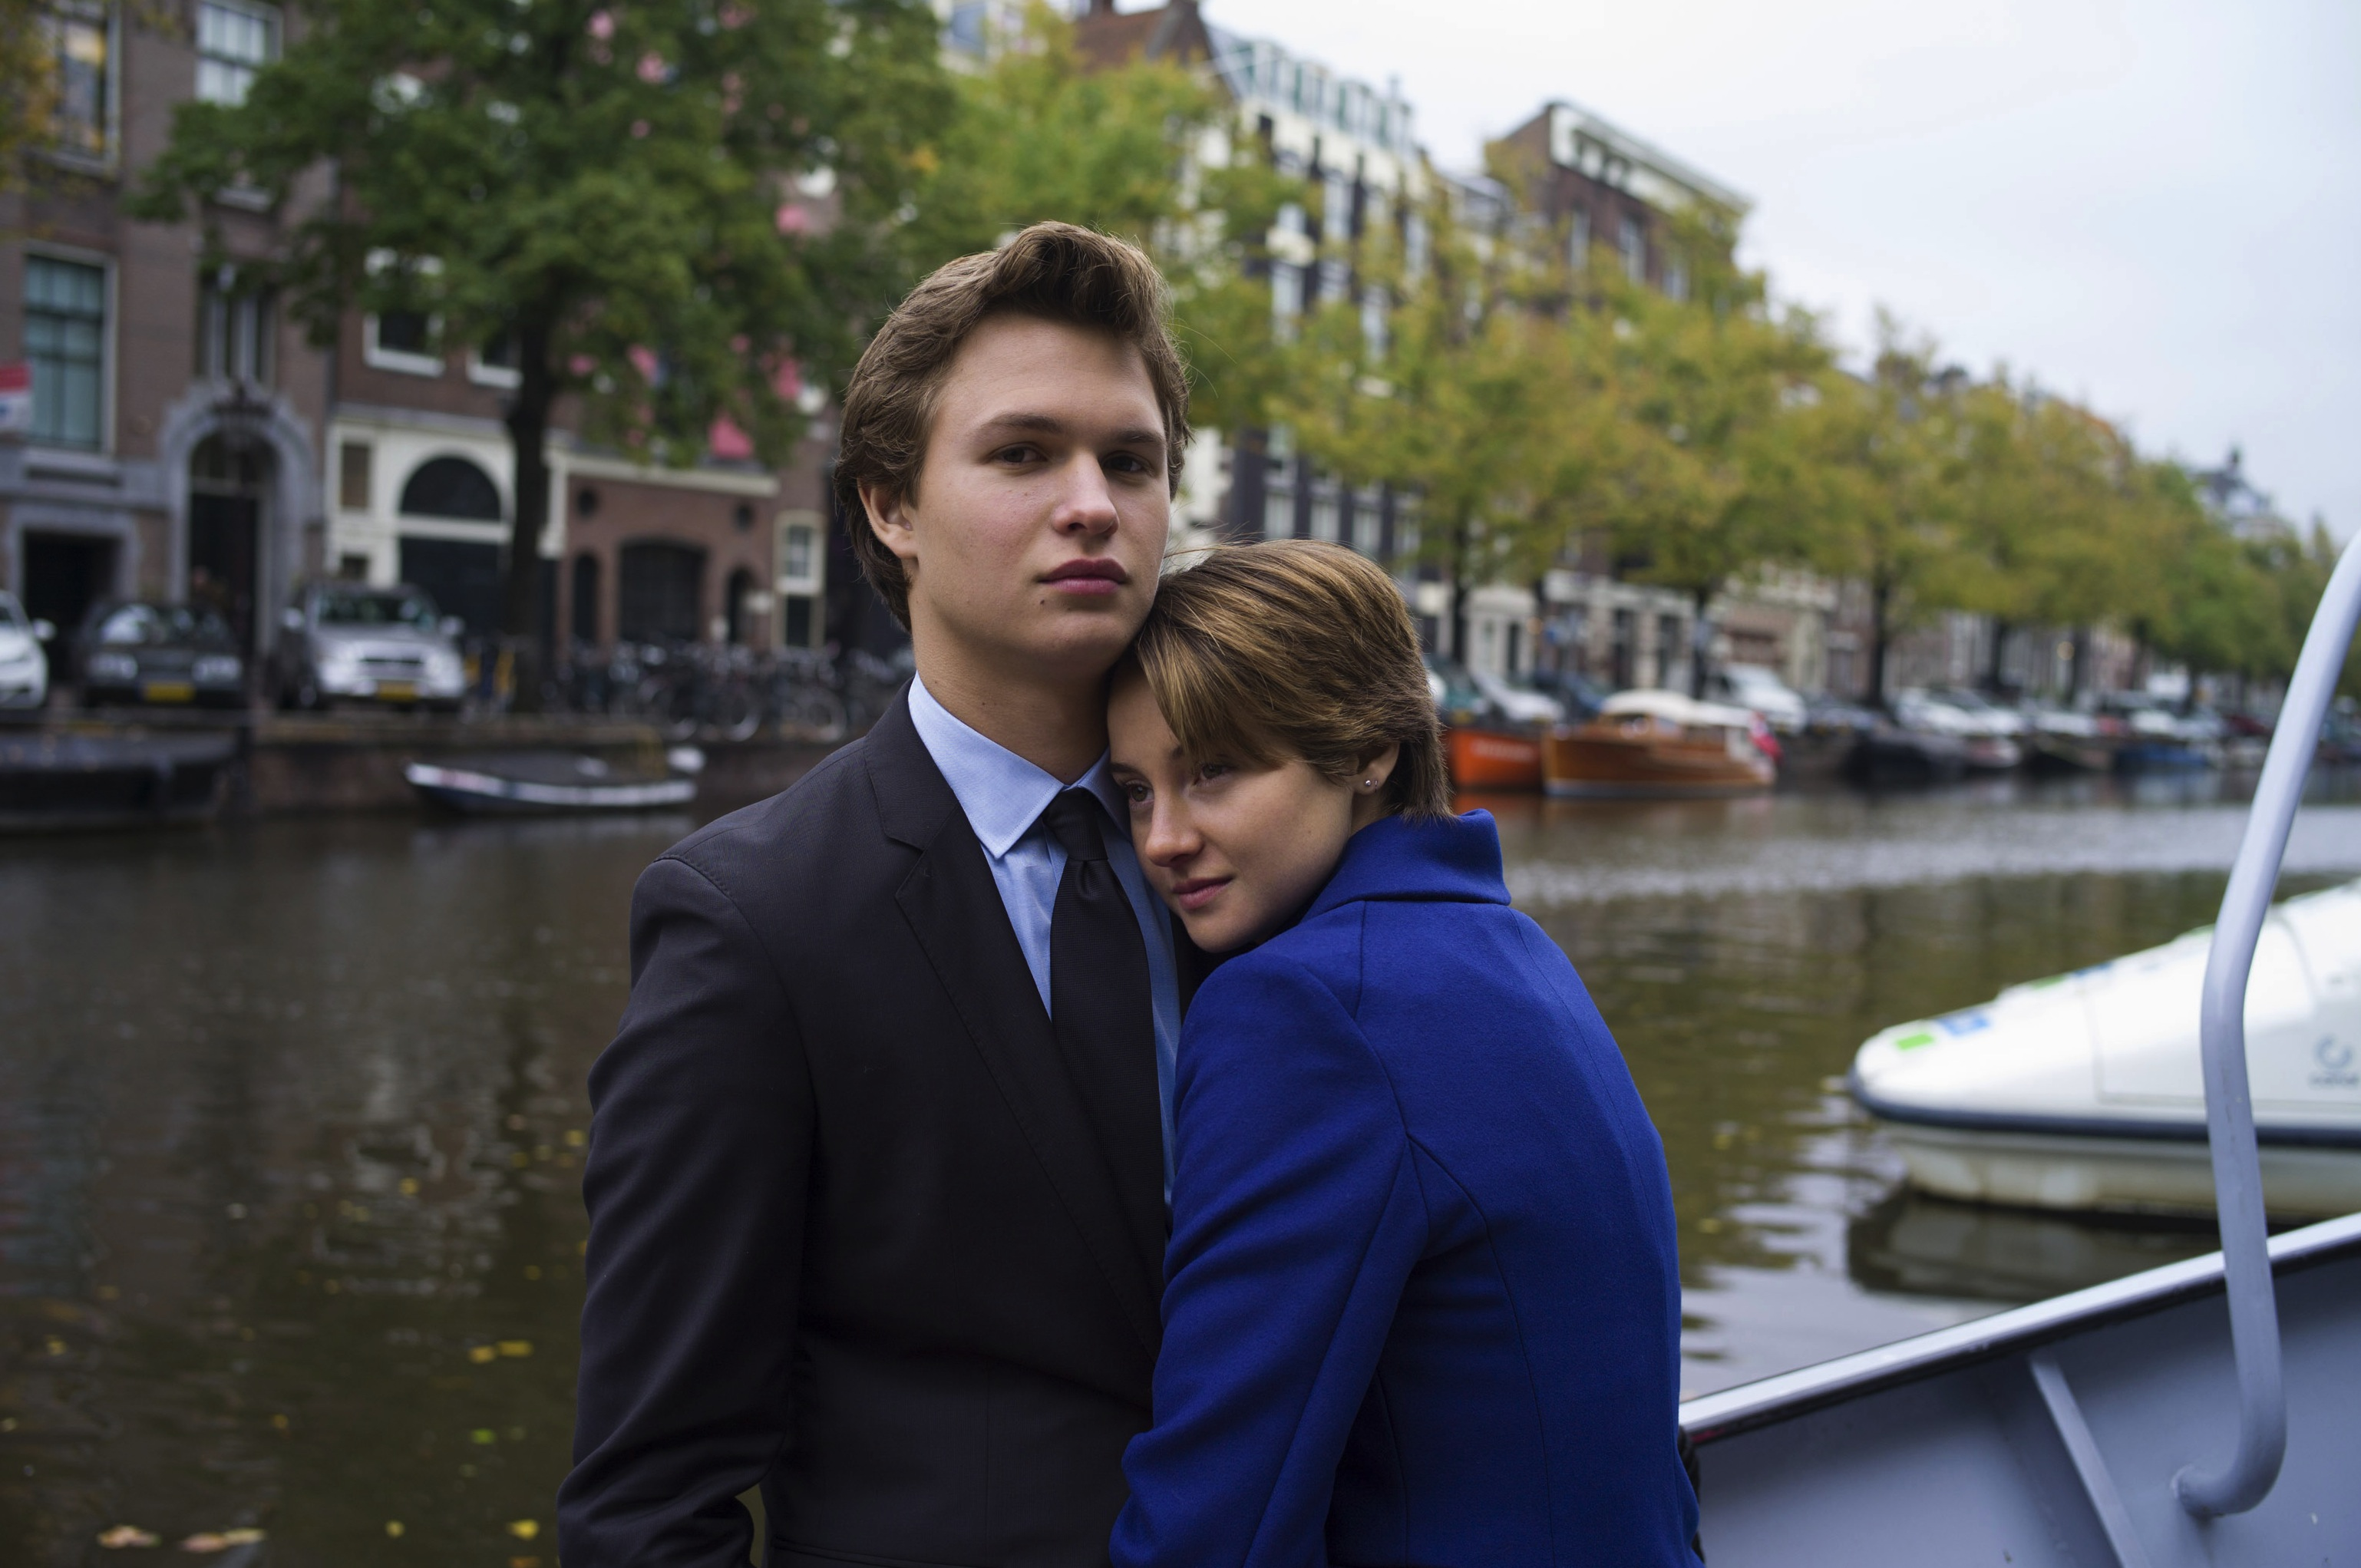 Hazel (Shailene Woodley) and Gus (Ansel Elgort)